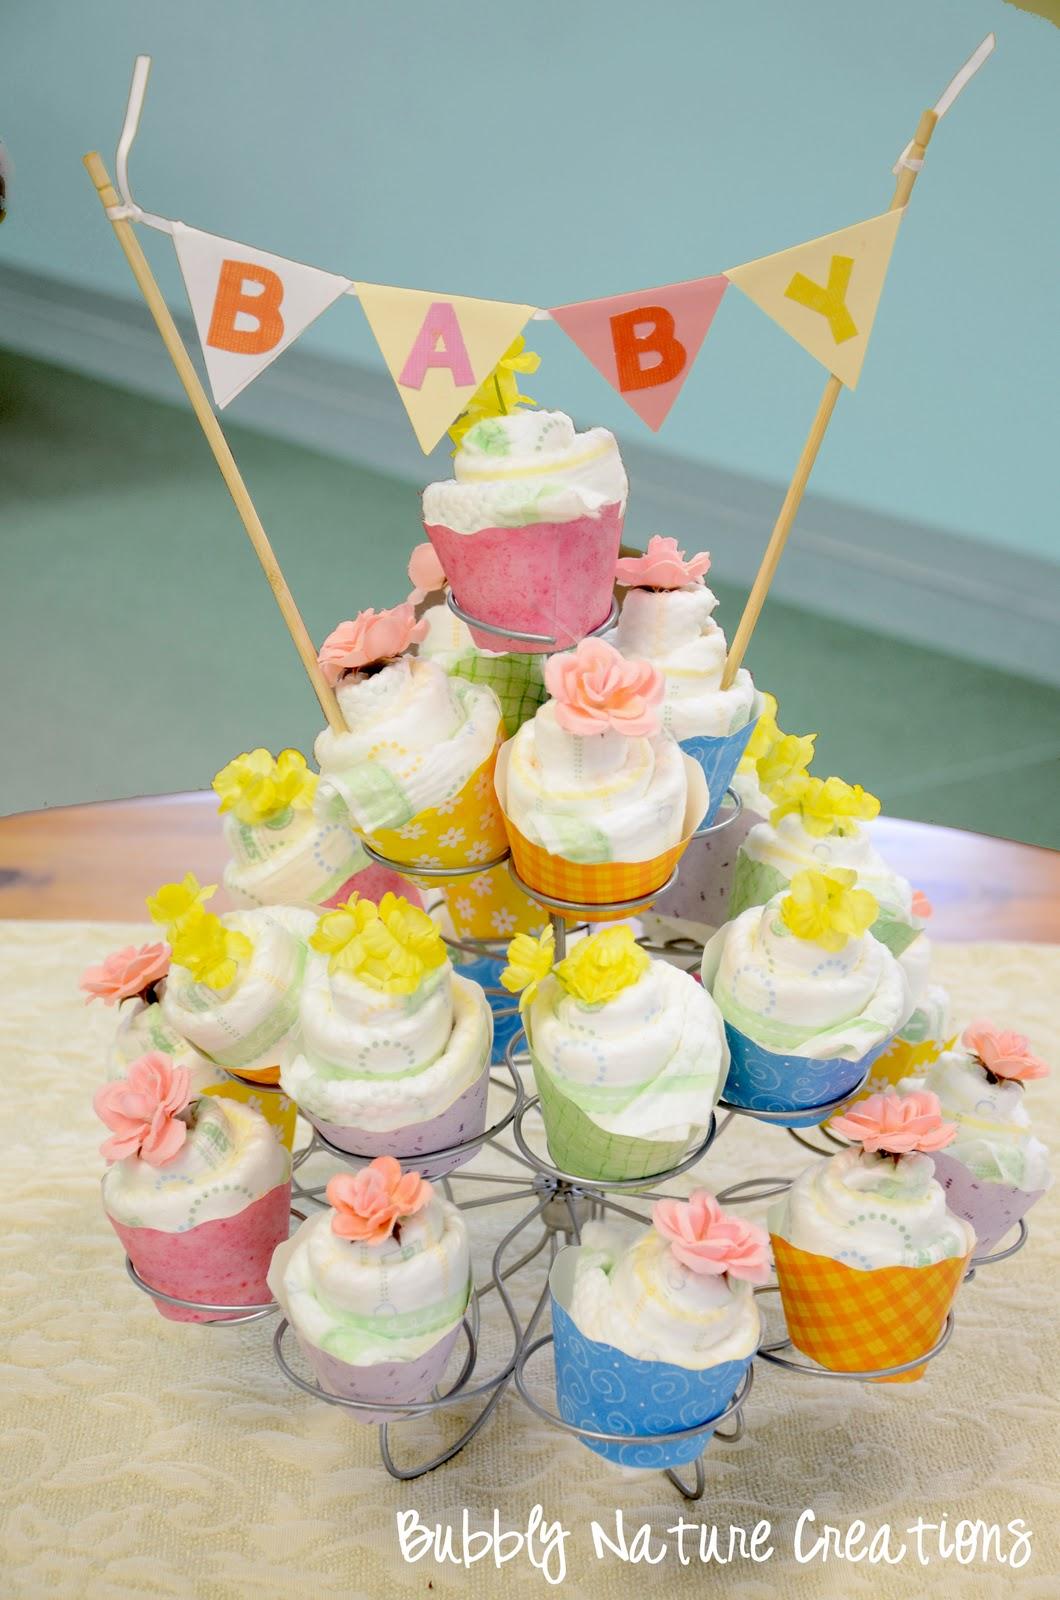 How to Make Diaper Cupcakes